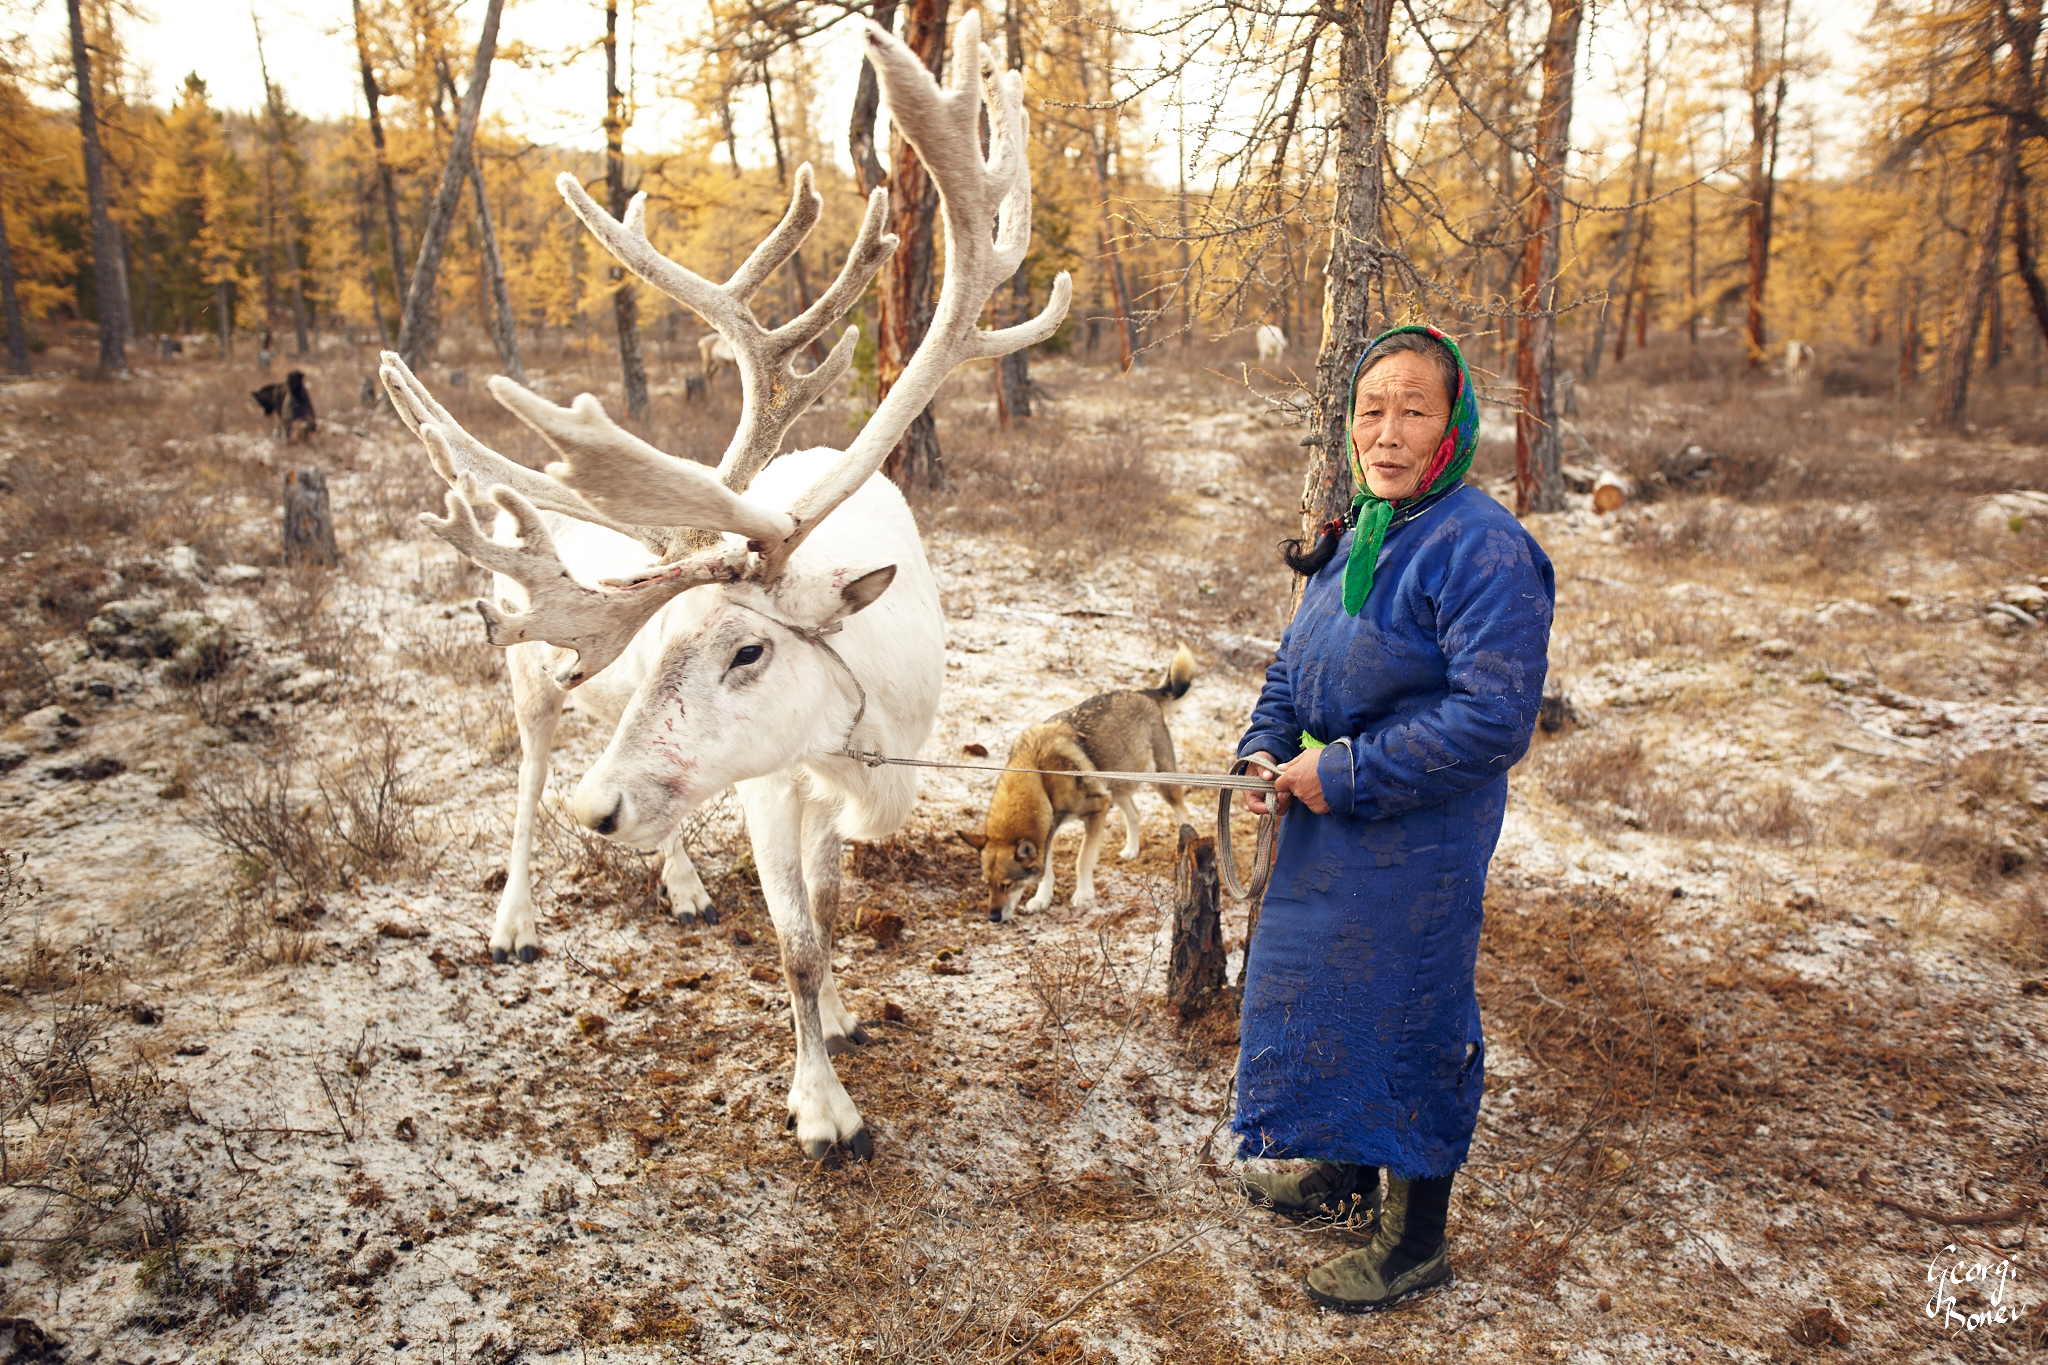 TSAATAN WOMAN IS PREPARING HER RAINDEER, MONGOLIA